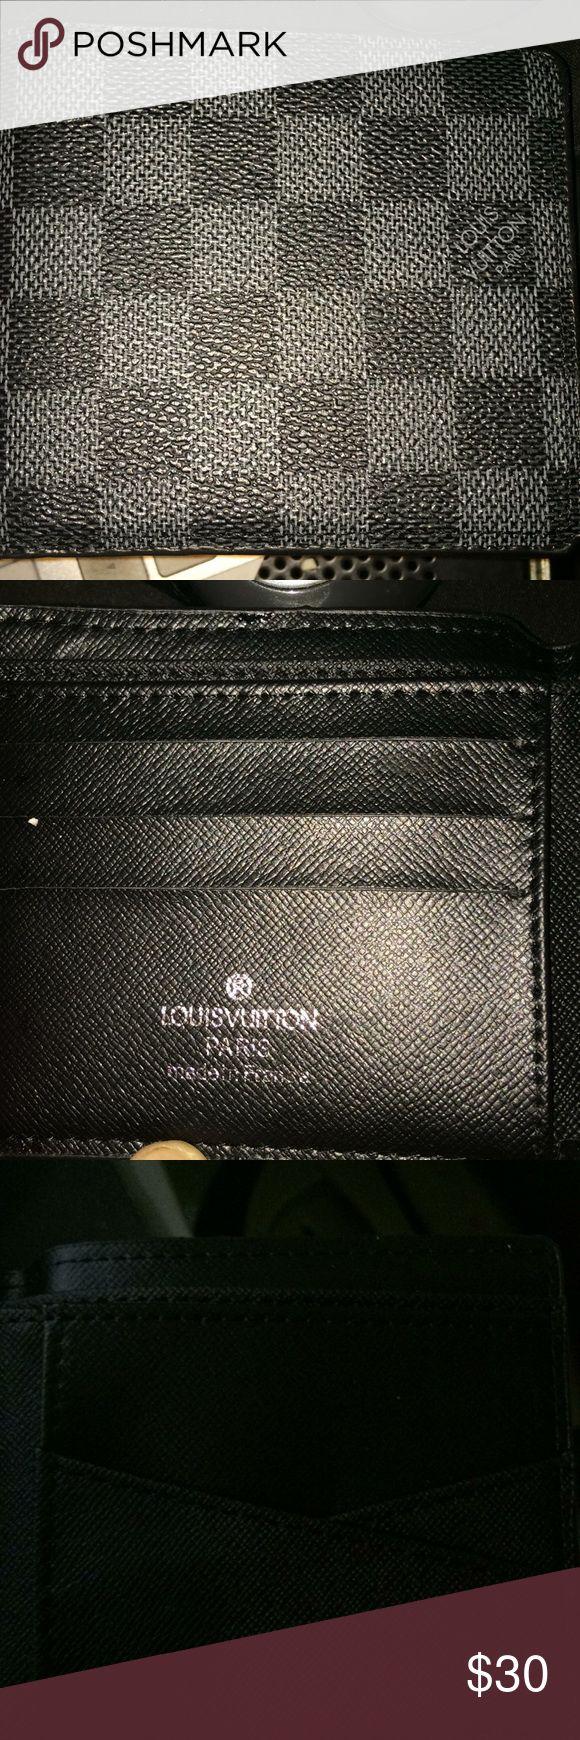 Louis Vuitton men's wallet Brand new Bags Wallets